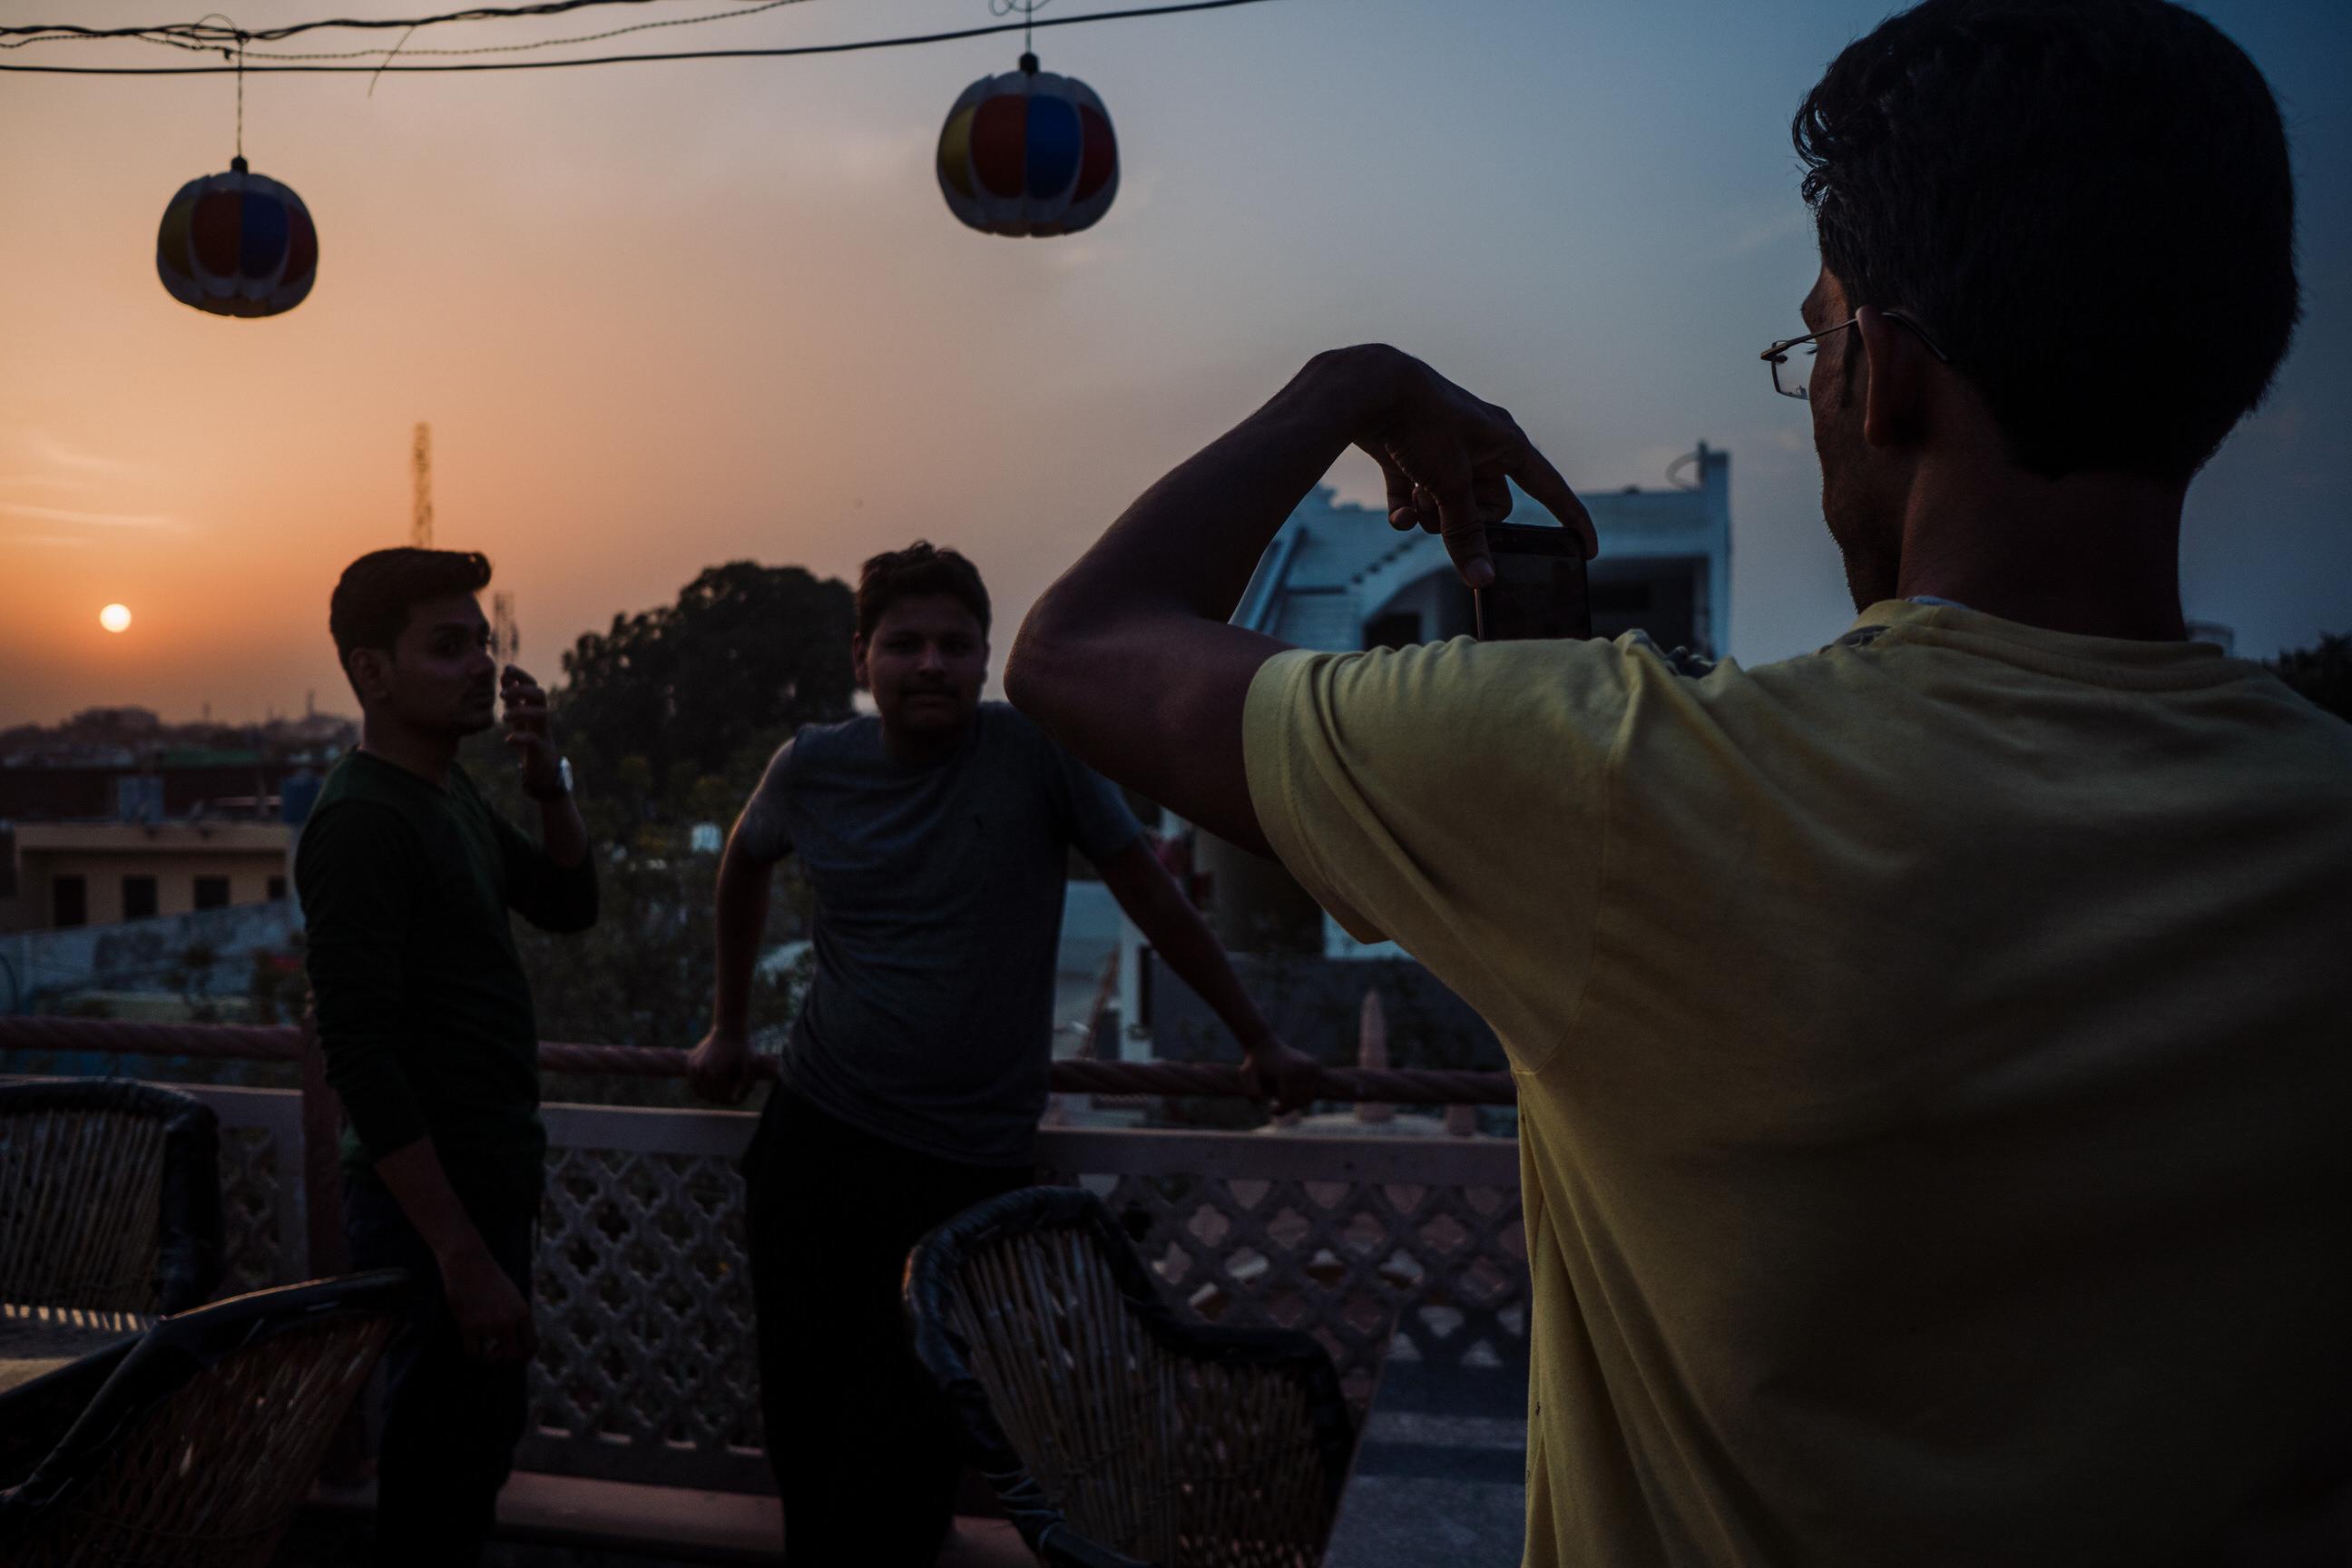 Moustache Hostel Agra